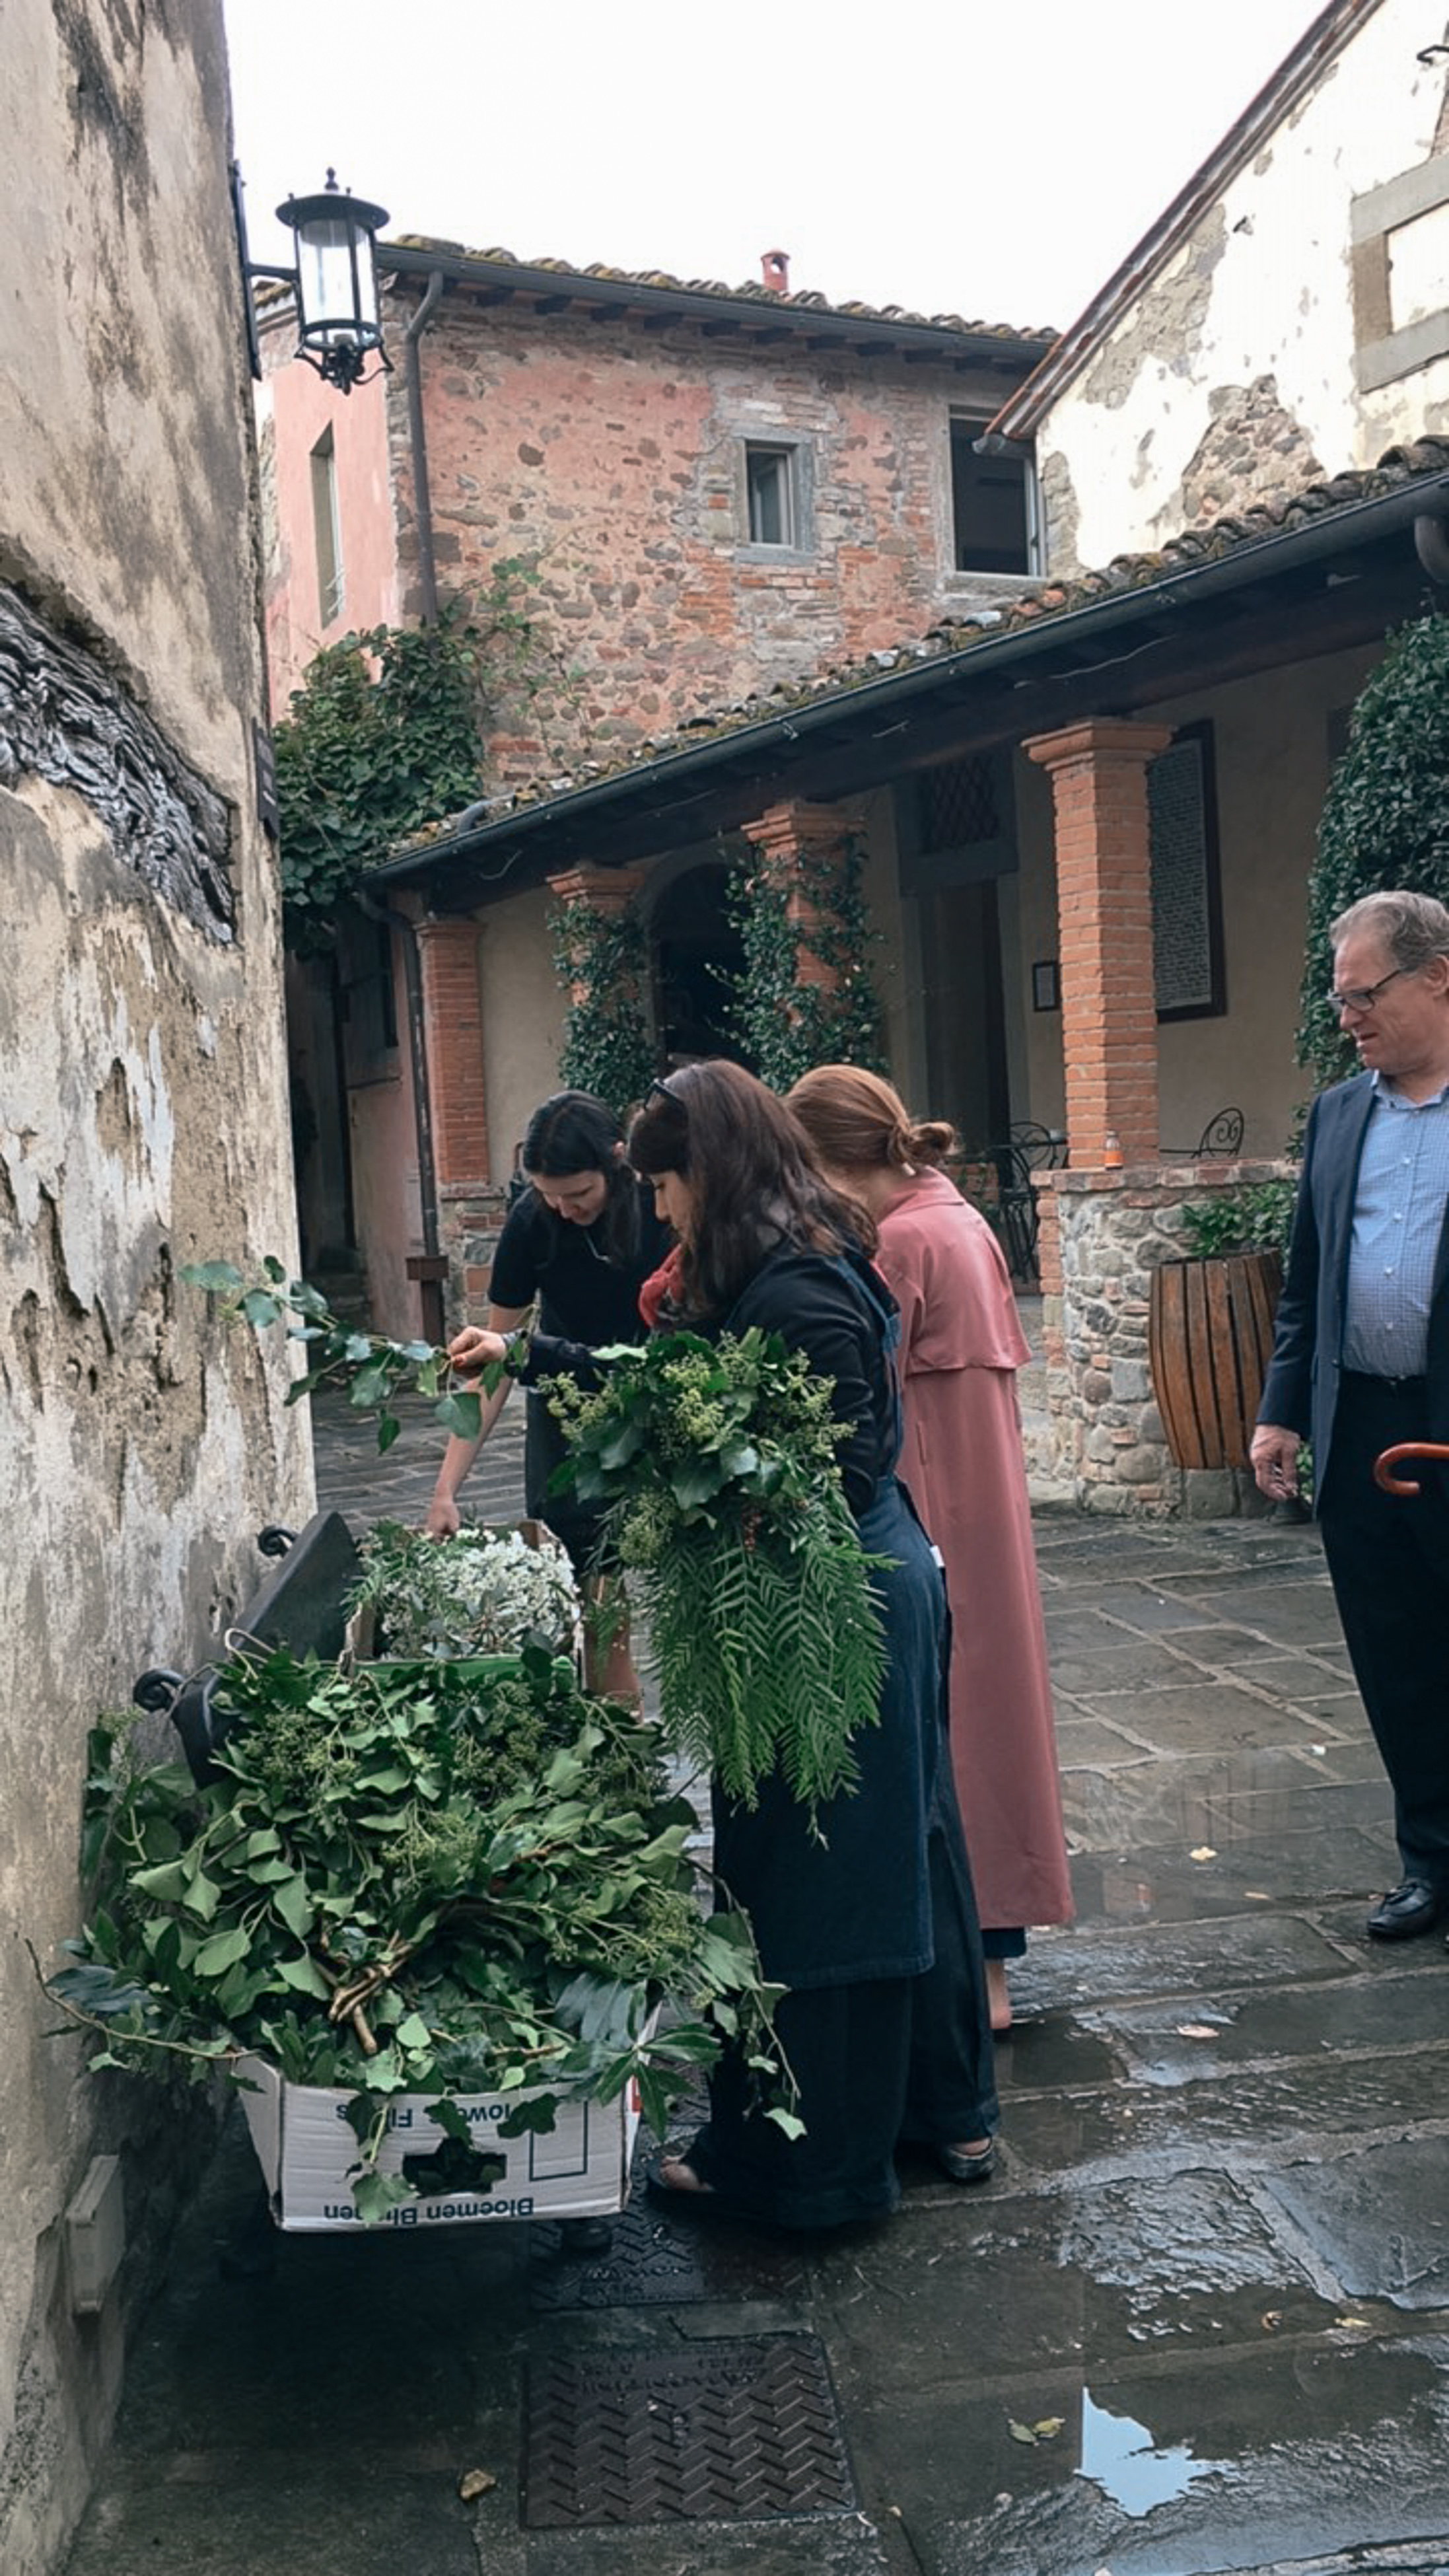 il-borro-toscana-wedding-tuscany-lifeonpine_Photo Oct 08, 11 22 14 AM.jpg